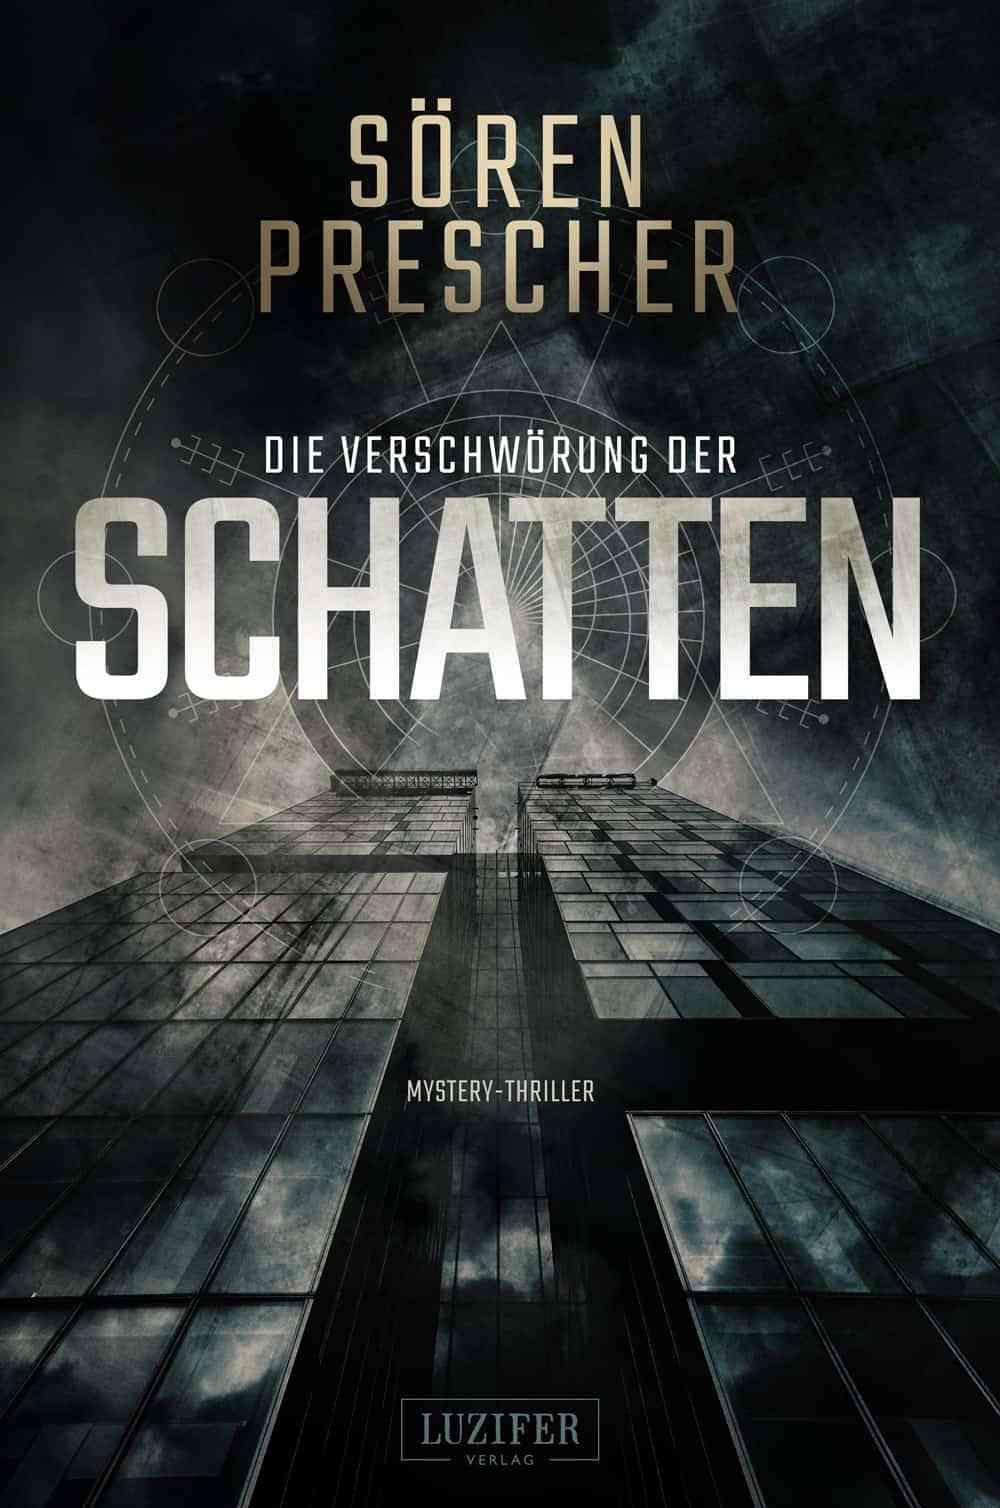 Prescher_Soeren_Die_Verschwoerung_der_Schatten_Phantastik-Autoren-Netzwerk.jpg